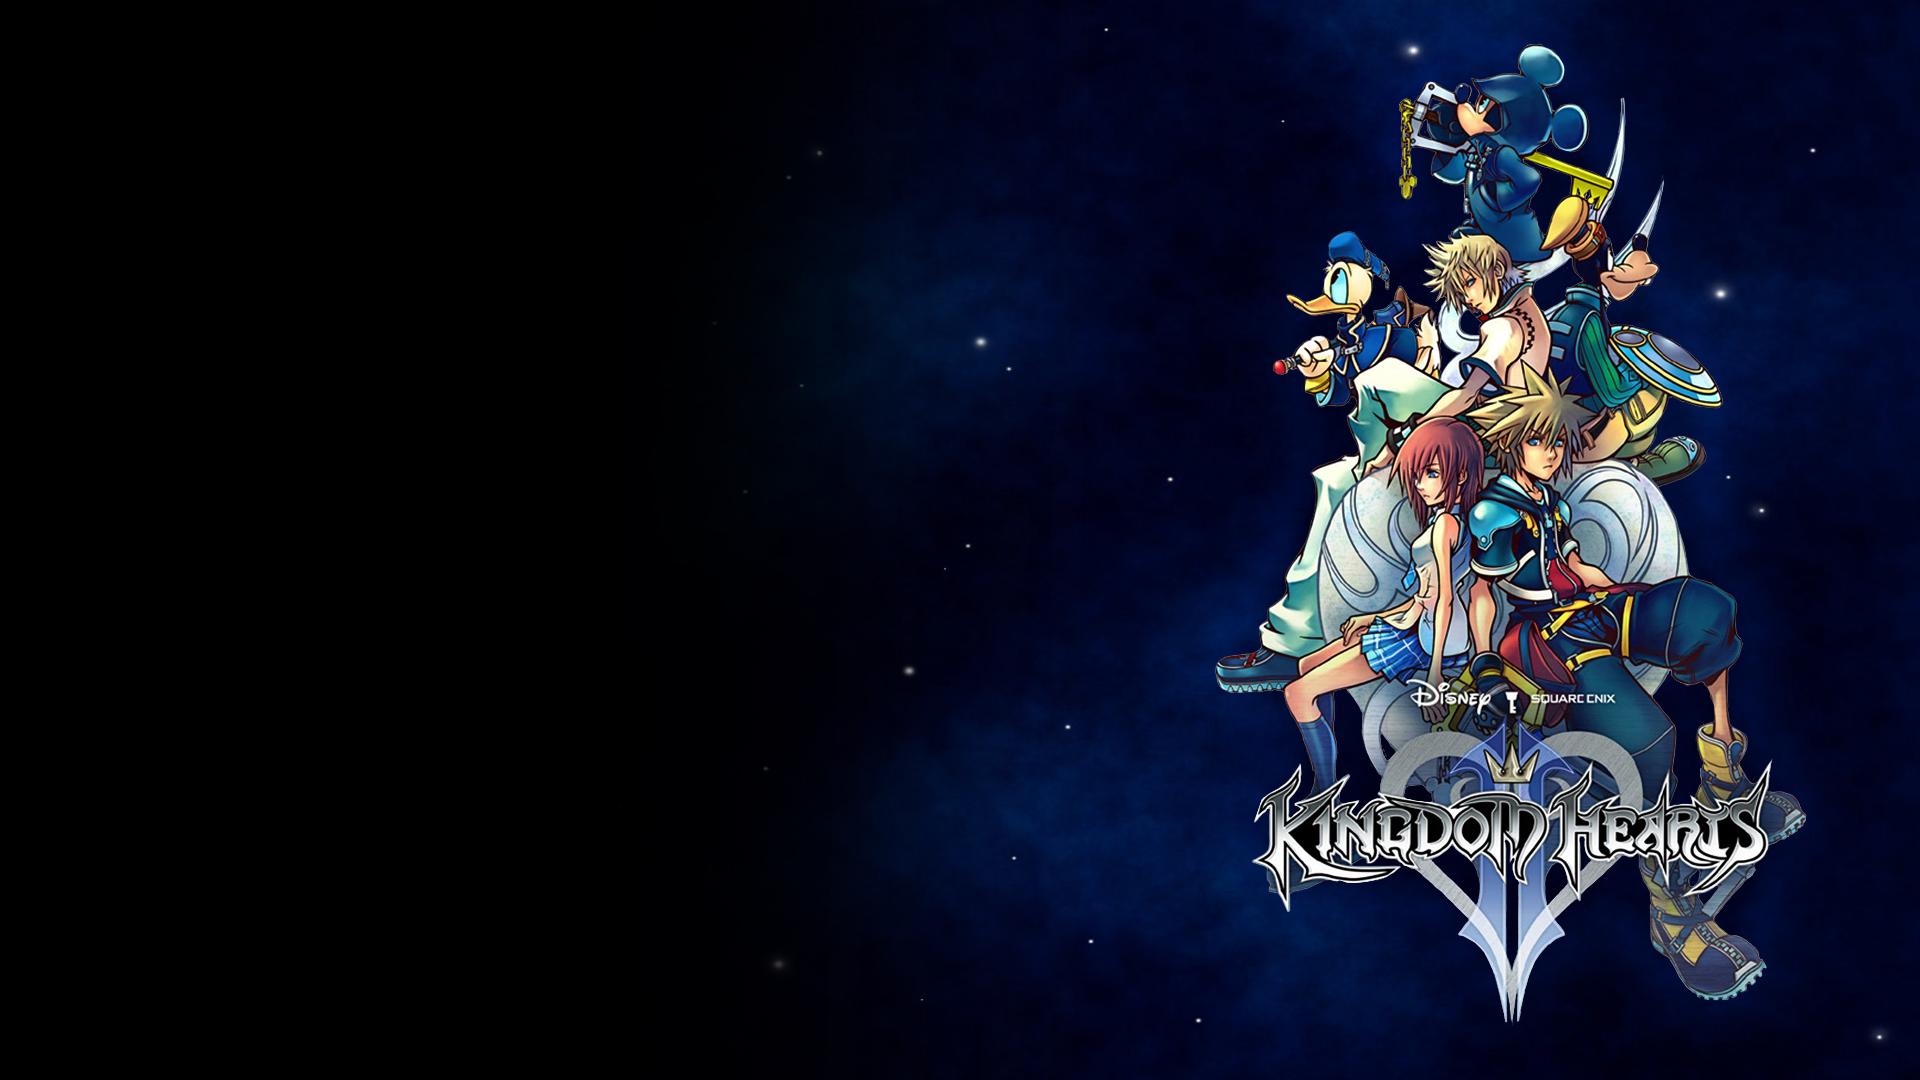 Kingdom Of Hearts Wallpaper Hd HD Wallpapers 1920x1080